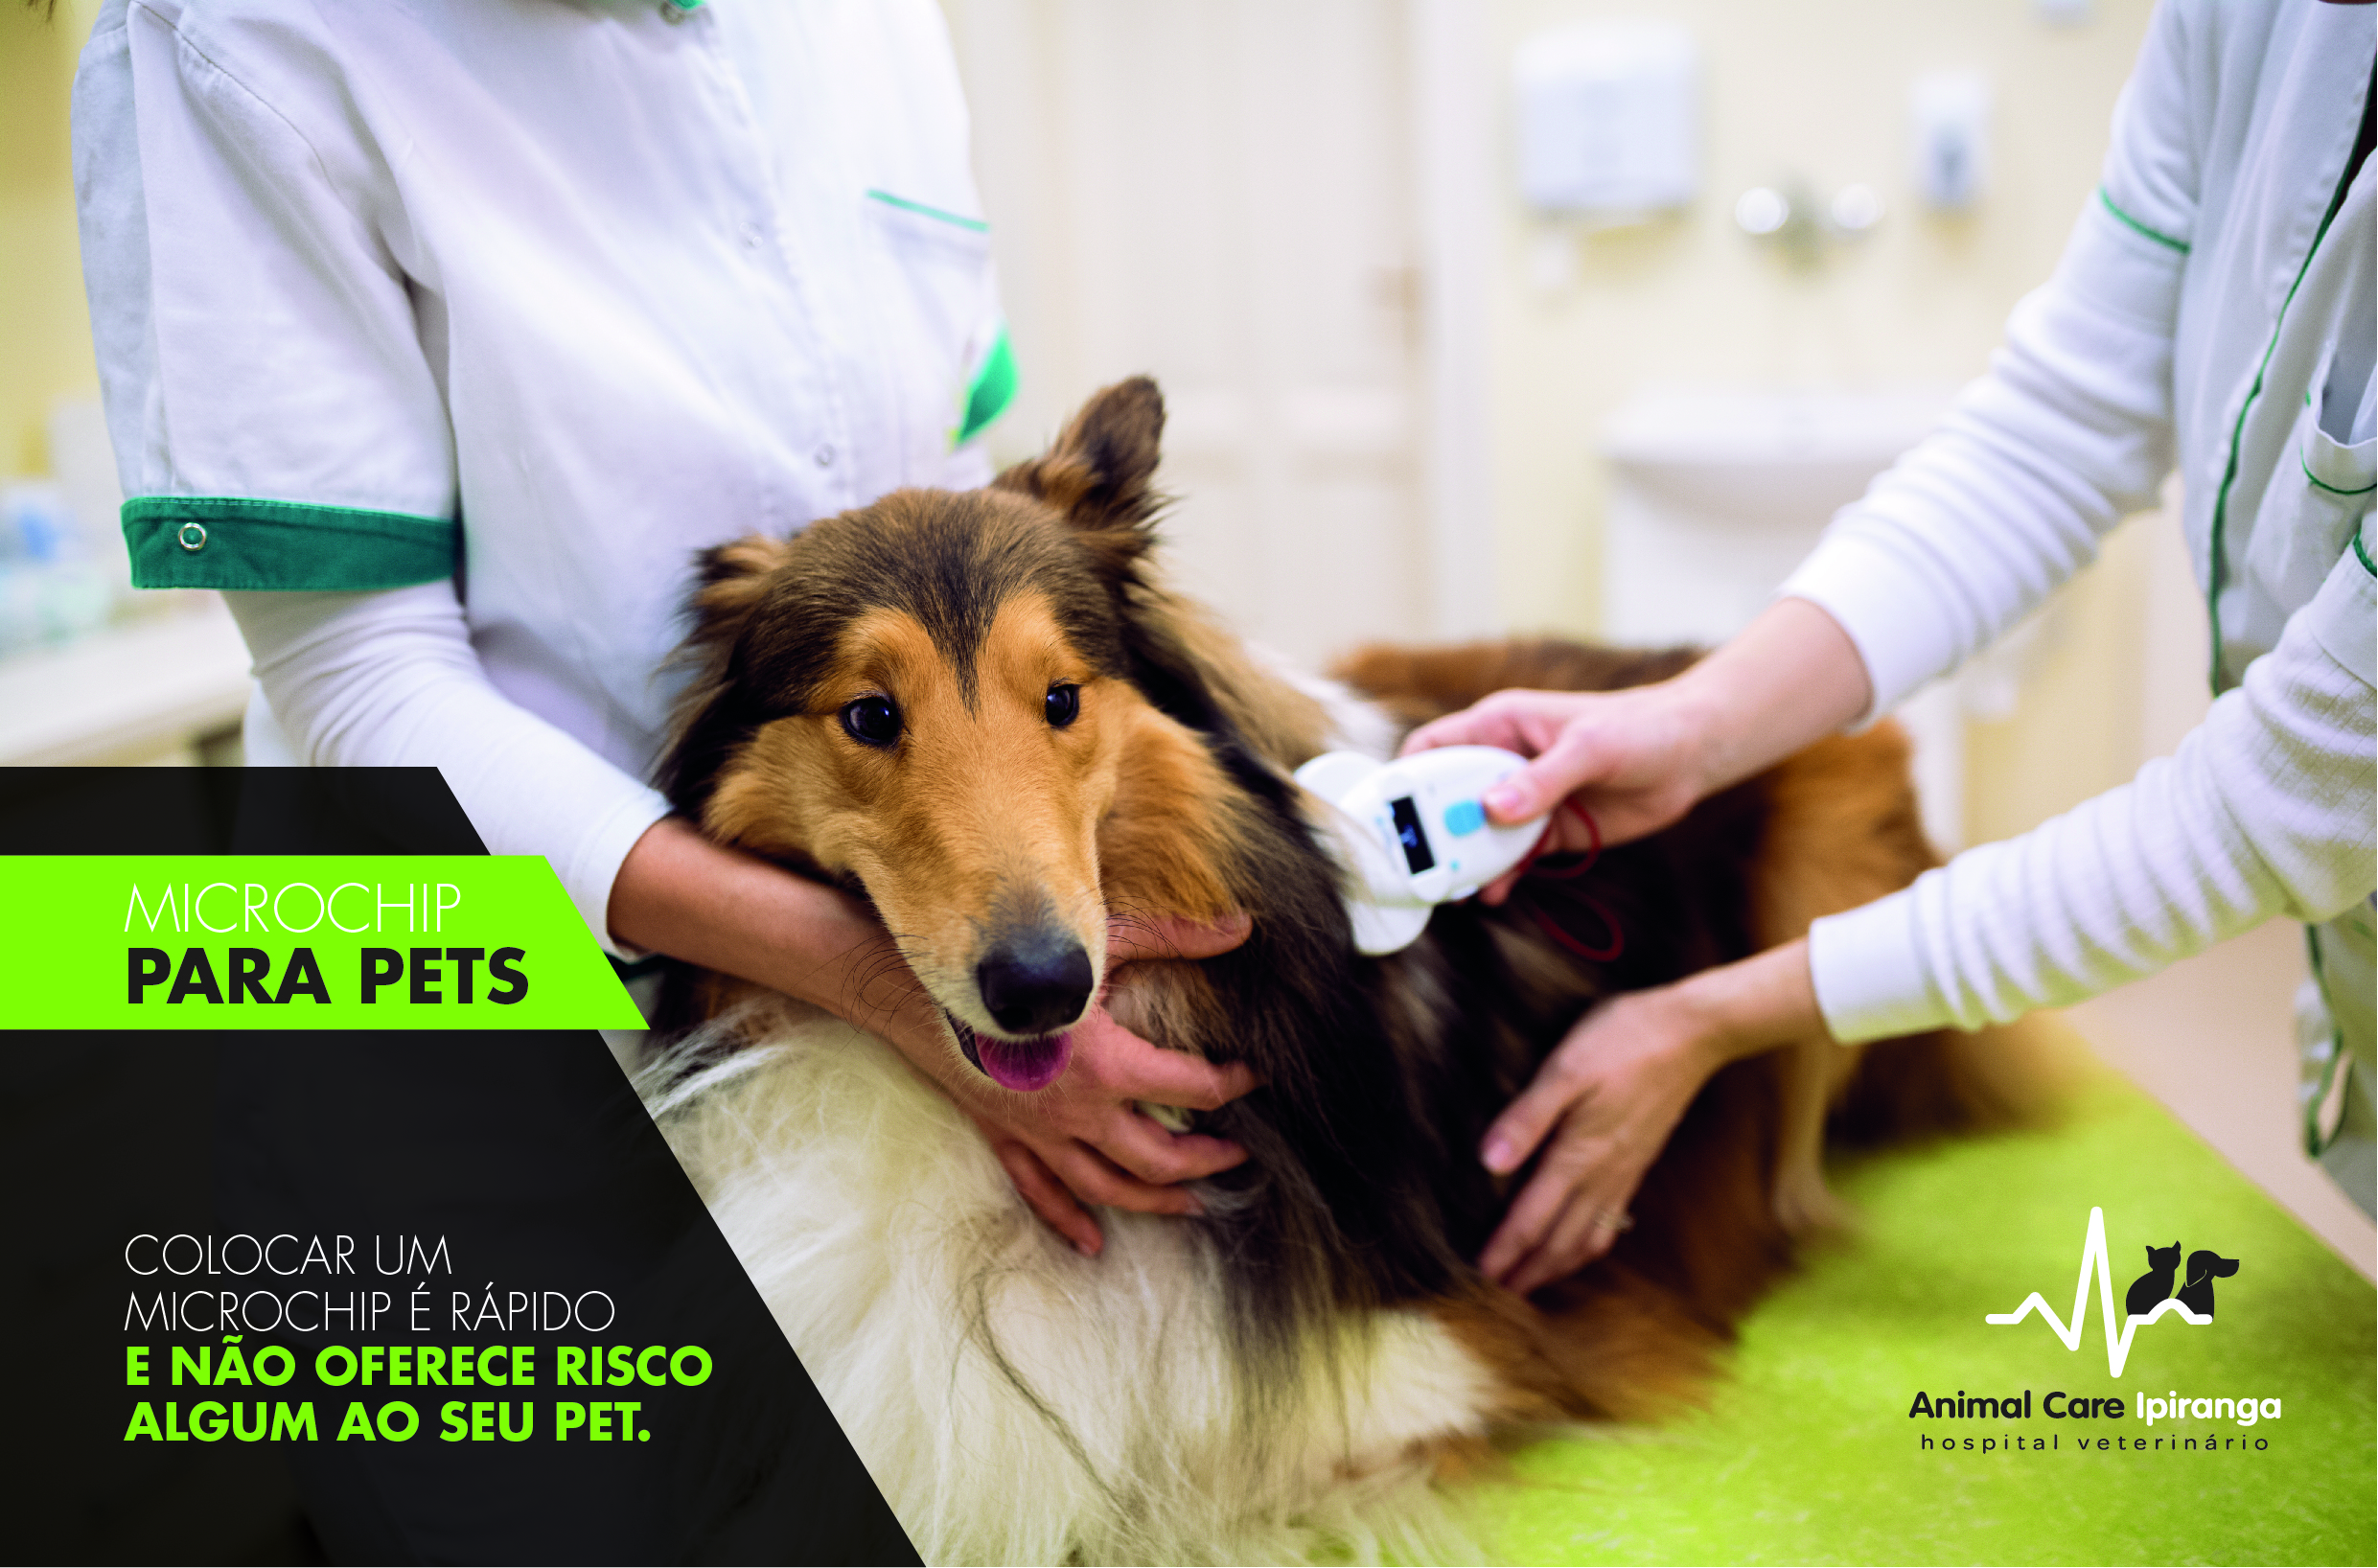 news_chip_para_pets_animal_ly01-01.jpg